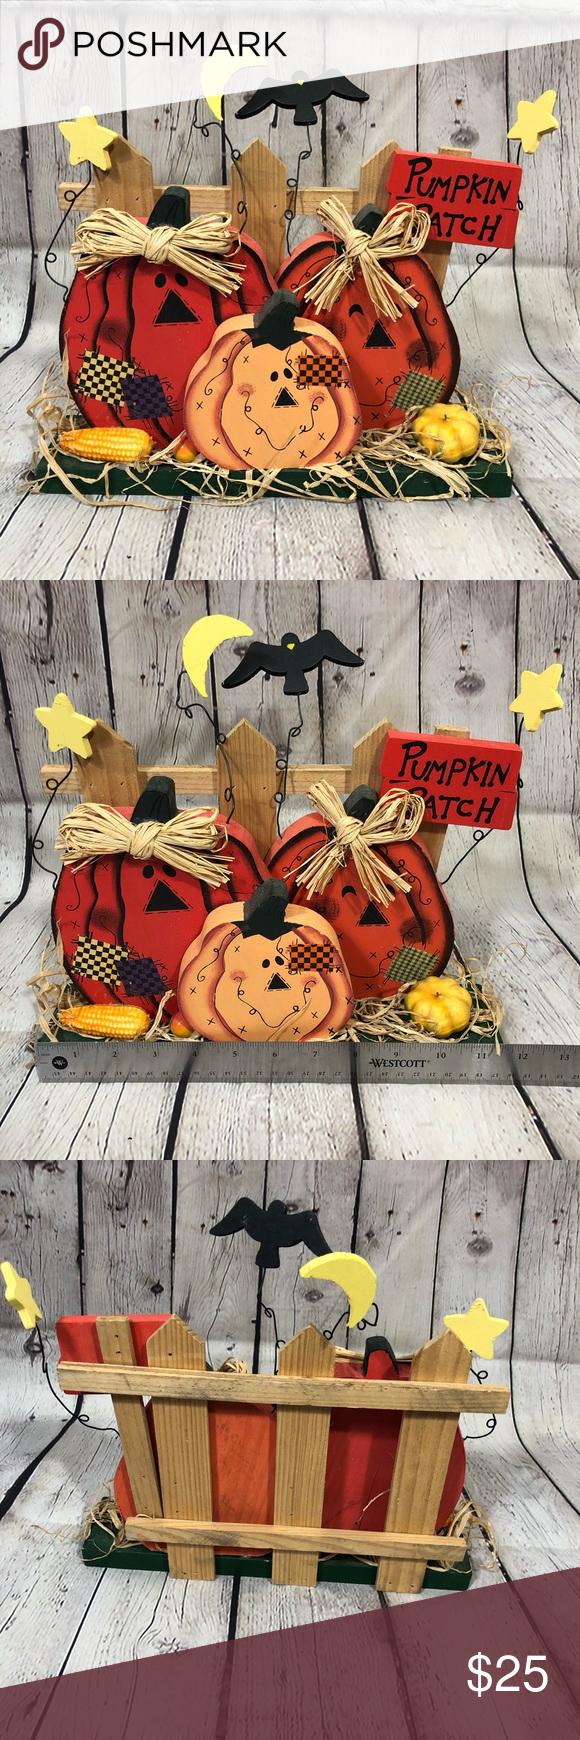 "Pumpkin Patch Scene Pumpkin Patch Scene. 11.5"" x 10.5"". 3 wood pumpkins, crows, moon, stars. Raffia straw, plastic pumpkin and corn. Holiday Holiday Decor #pumpkinpatchoutfit"